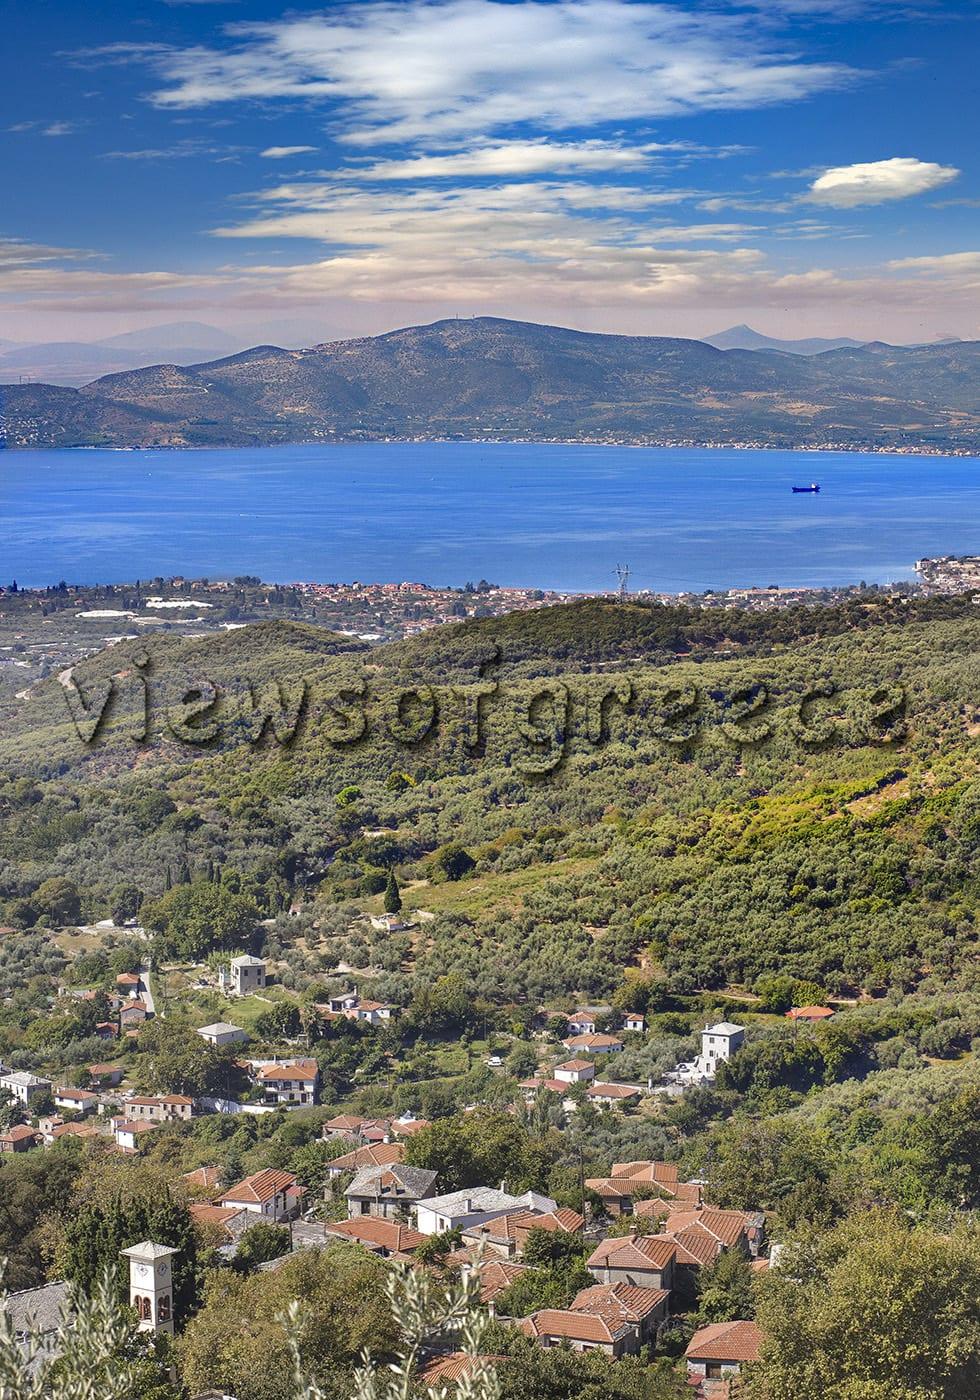 greece, travel, drakia, agios lavrentios, pilion, pilio, magnisia, , greek. Πήλιο, Άγιος Λαυρέντιος, Δράκεια, αποδράσεις, πεζοπορία, παραδοσιακός οικισμός, καλντερίμια, Νότιο Πήλιο, Αγριά,